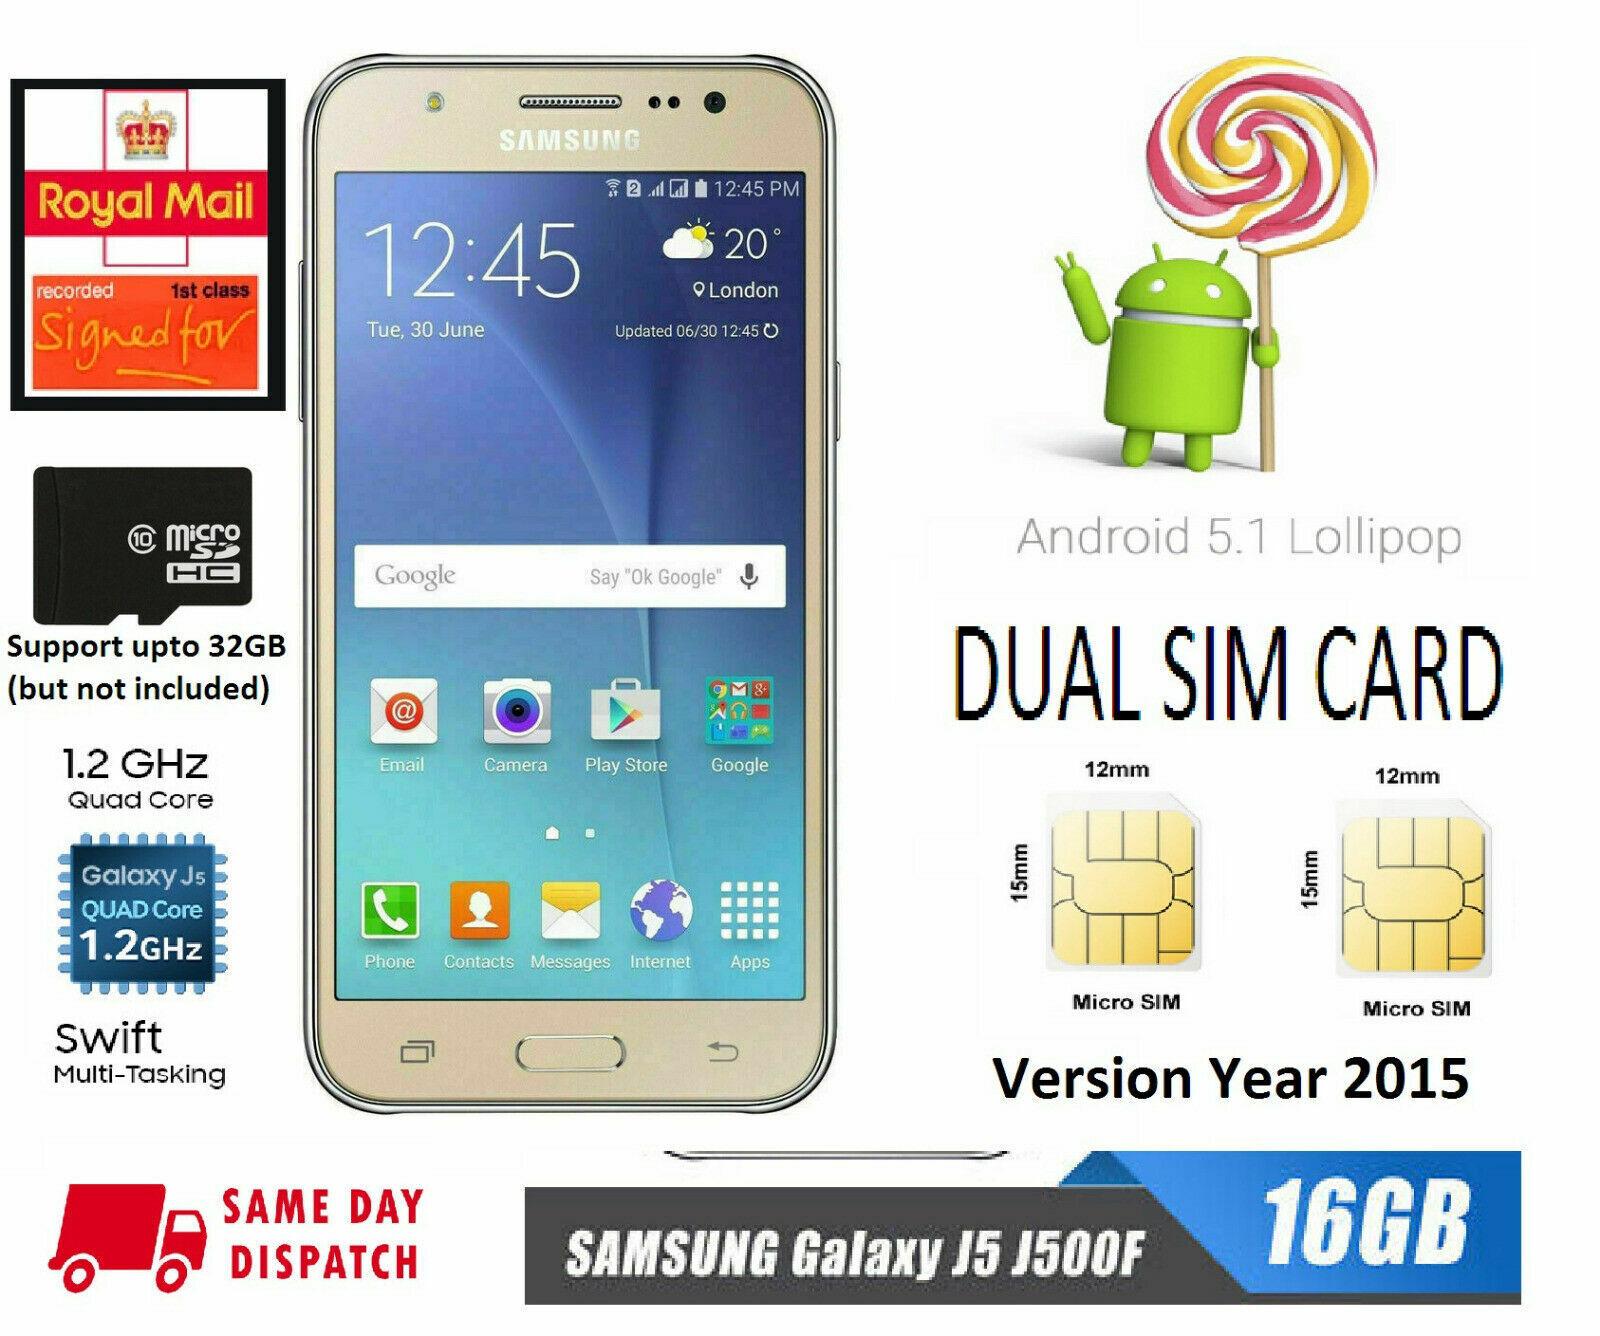 Android Phone - Boxed 4G 16GB Dual SIM Samsung Galaxy J5 J500F SIM Unlock Android Smart Phone UK